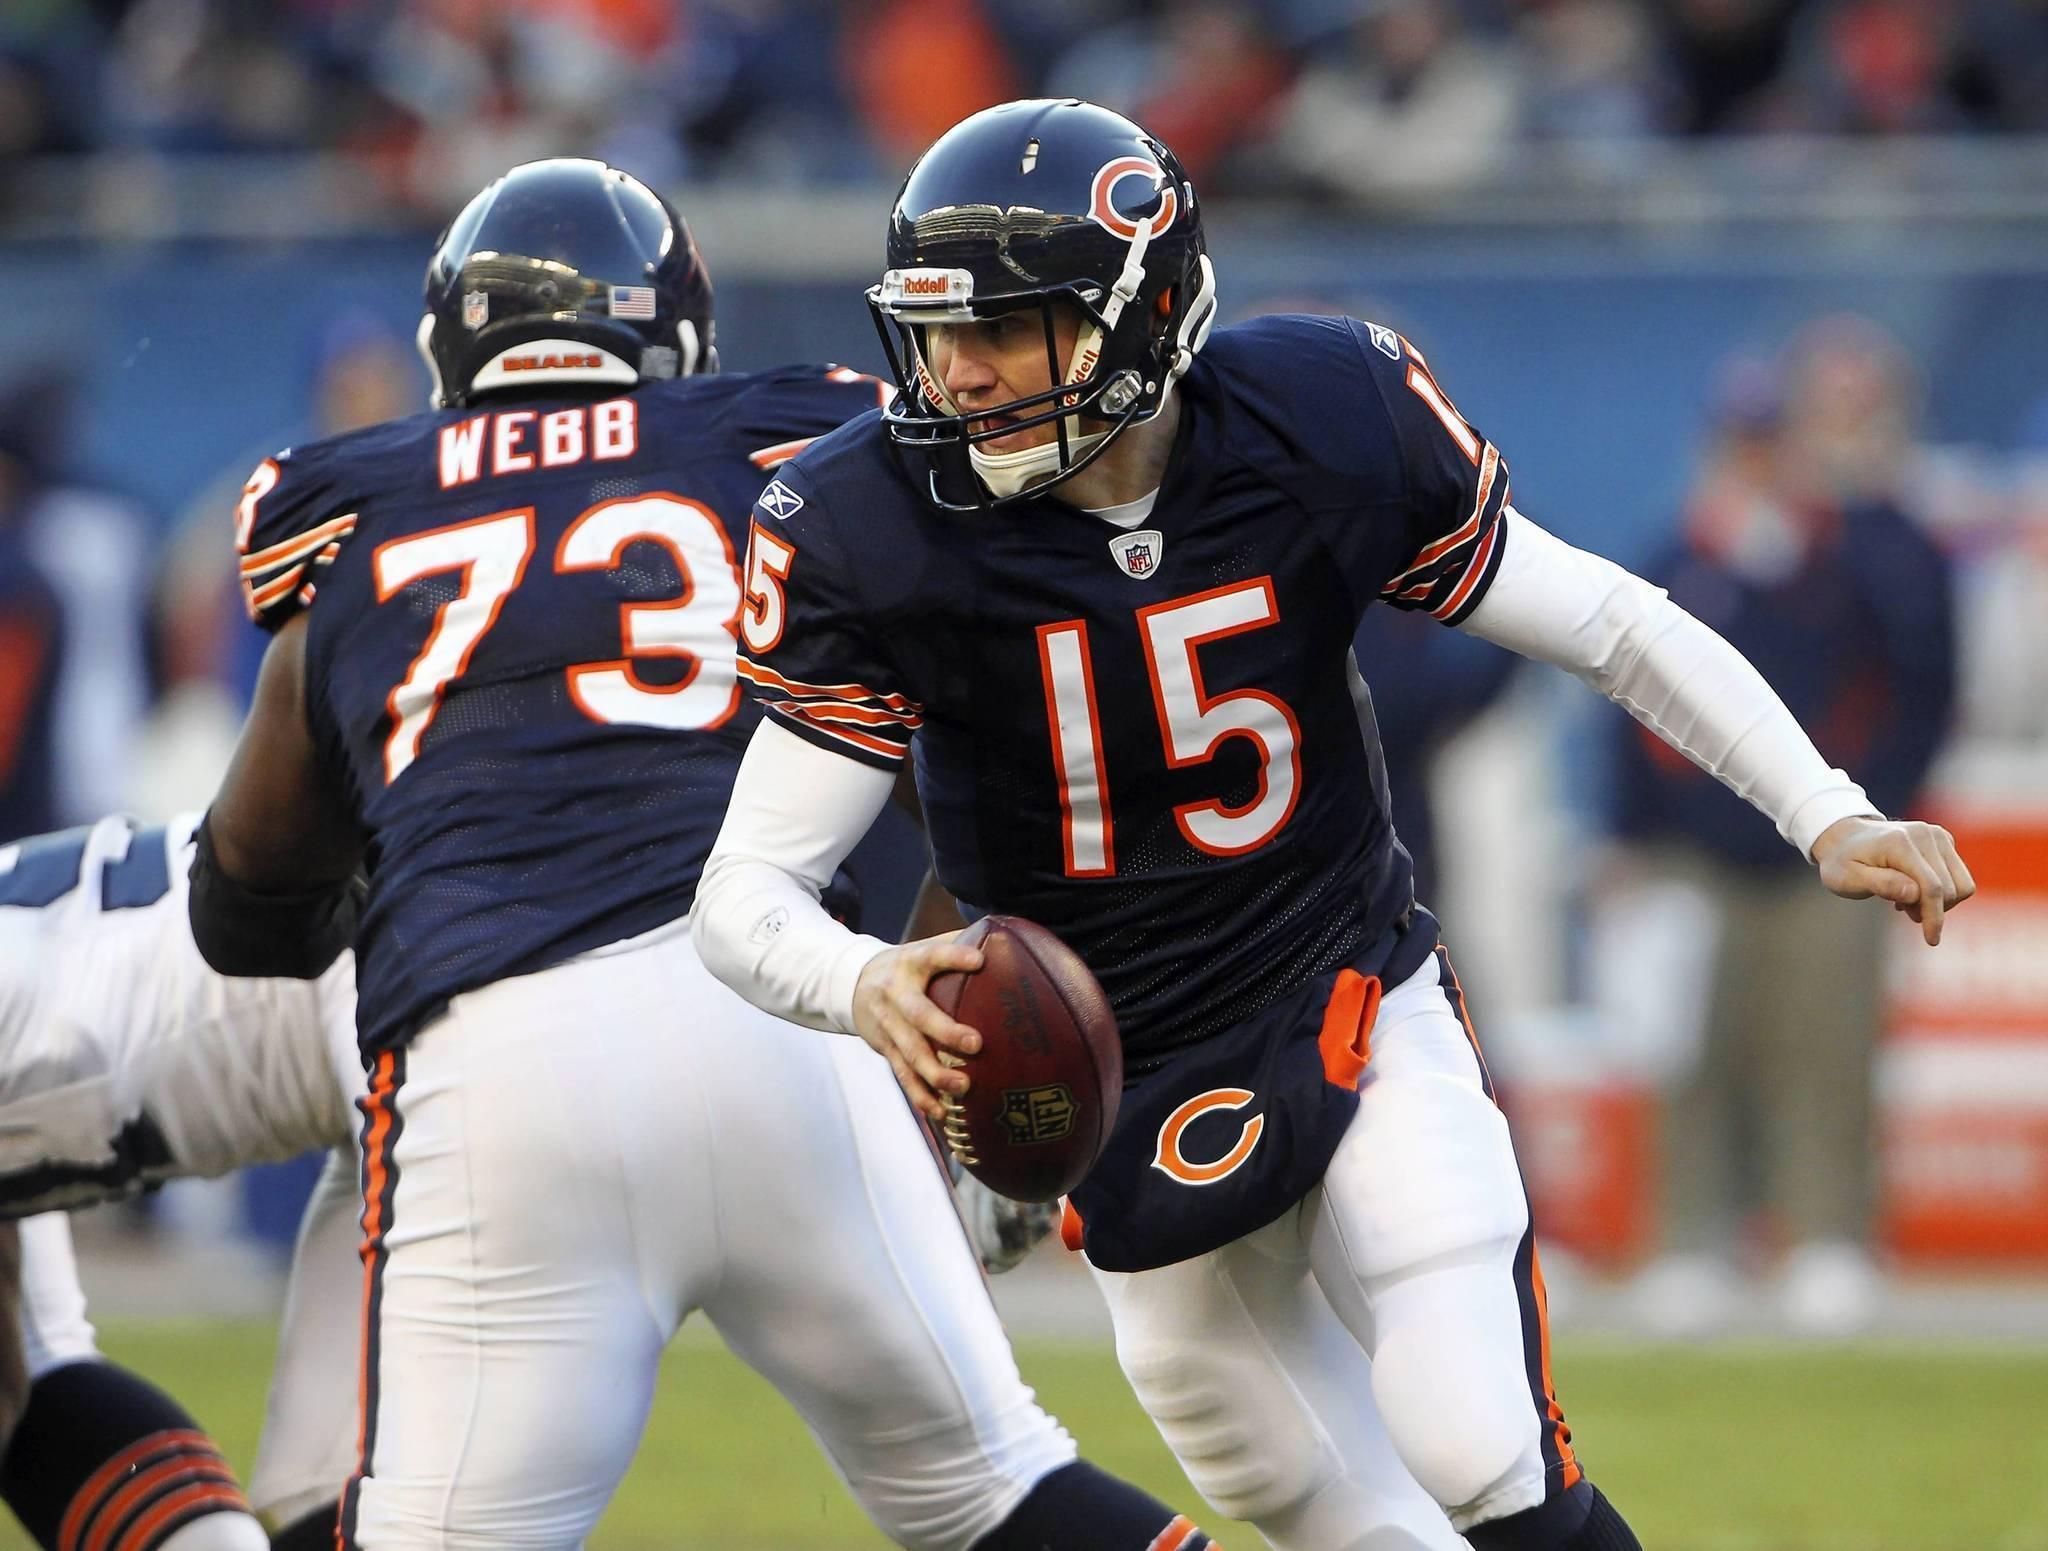 Former Bears quarterback Josh McCown retires after 16 seasons in the NFL